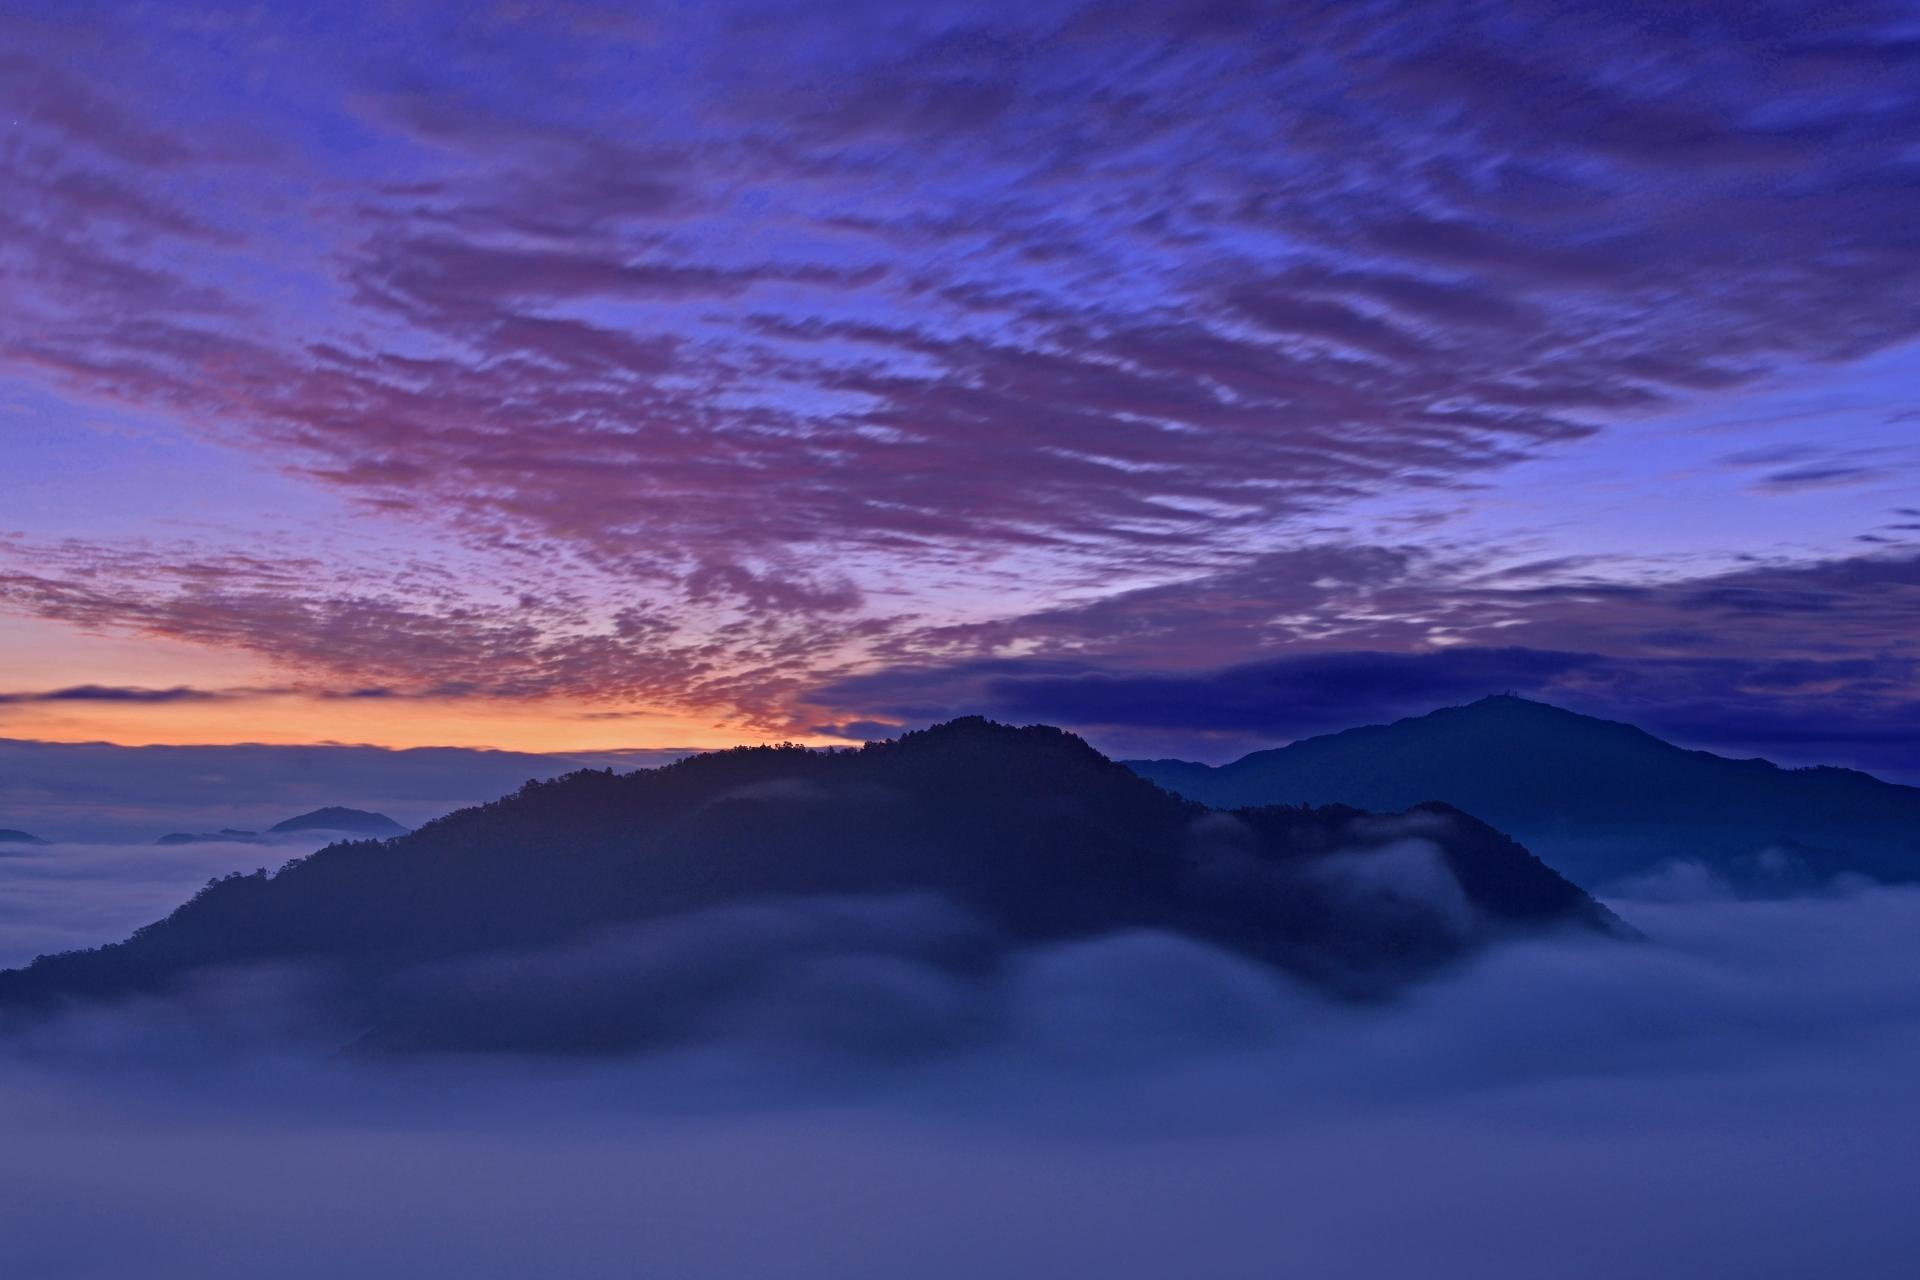 3921890_m 兵庫県 竹田城(雲海に包まれる秋におすすめの絶景写真スポット!アクセス情報や雲海の発生条件など)